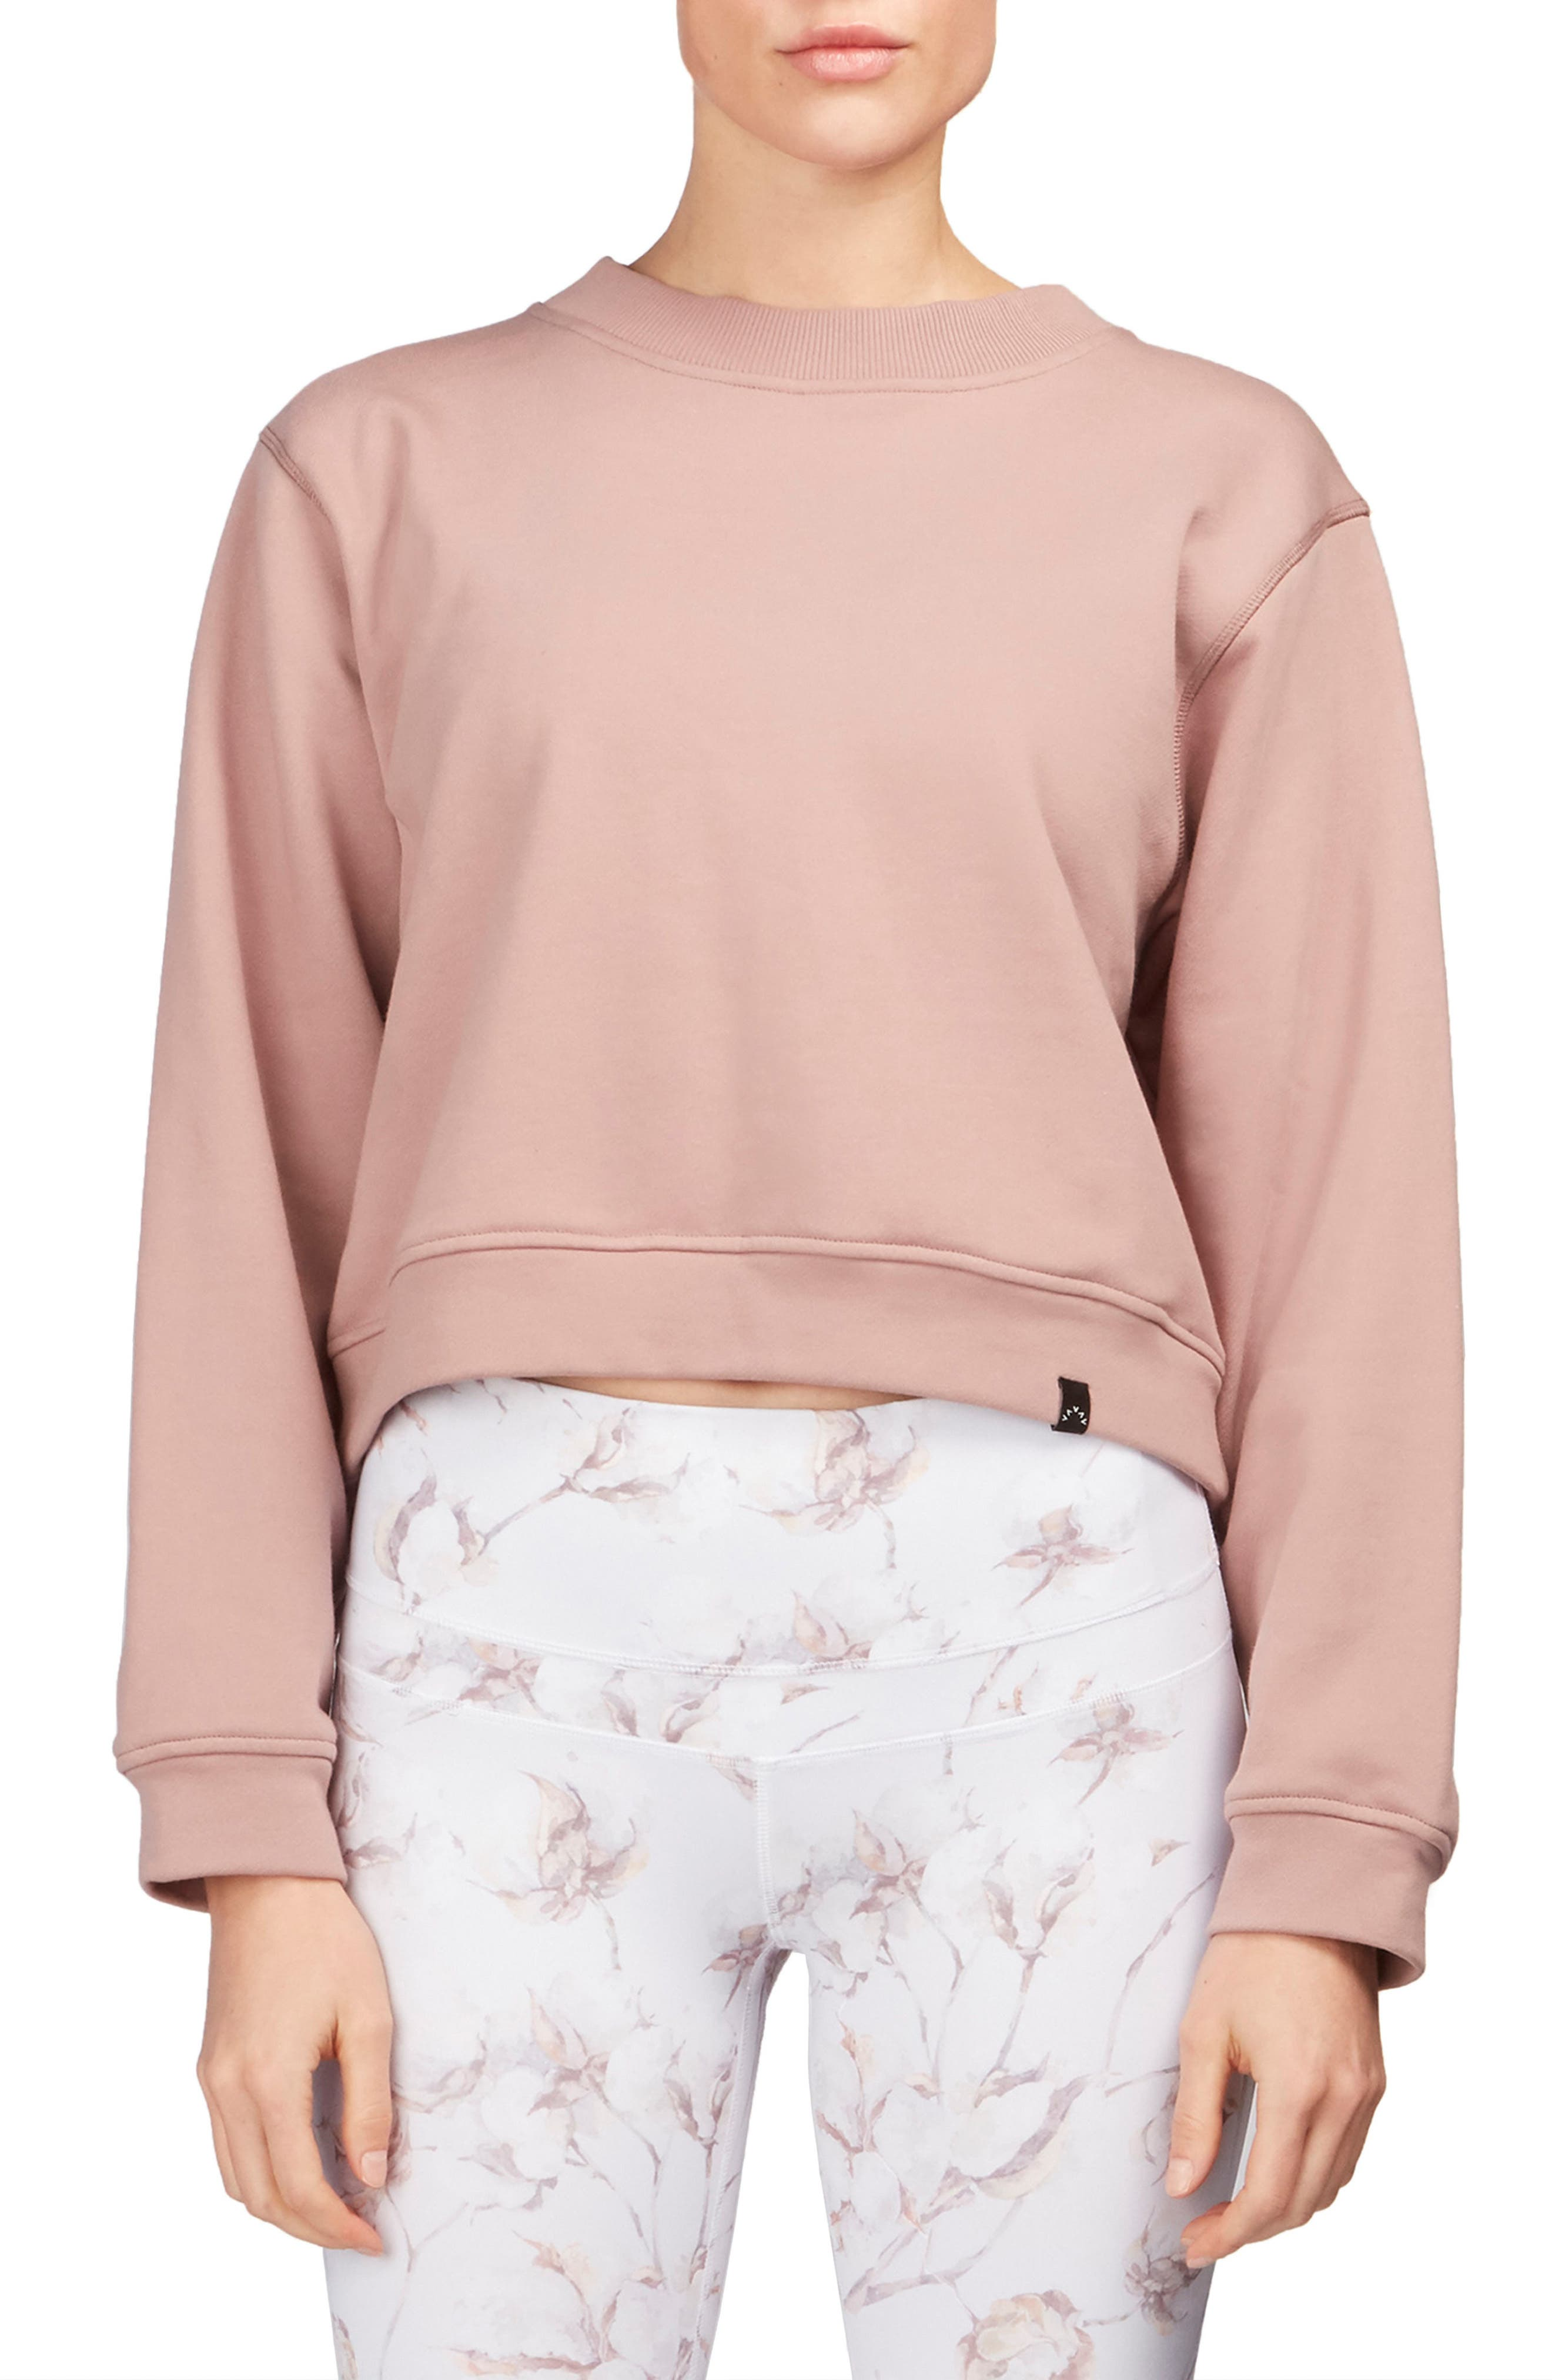 Albata Sweatshirt,                         Main,                         color, 650